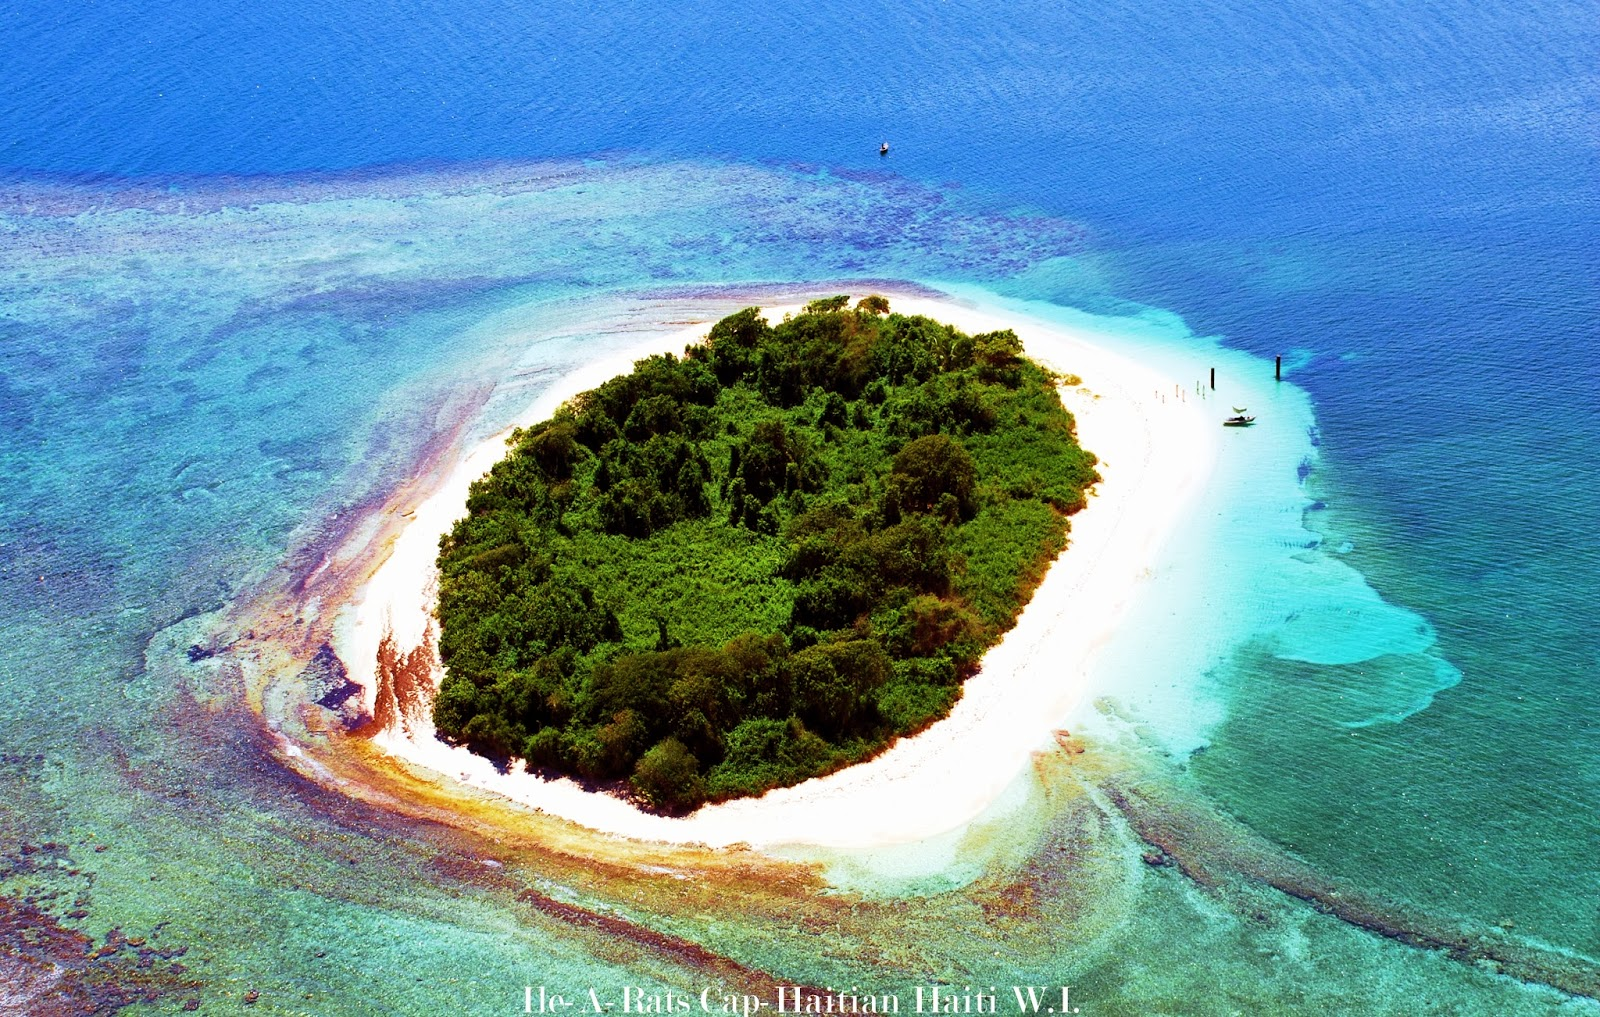 Labadie Bay City >> Musings of a Haitian American Male: La Plage/The Beach